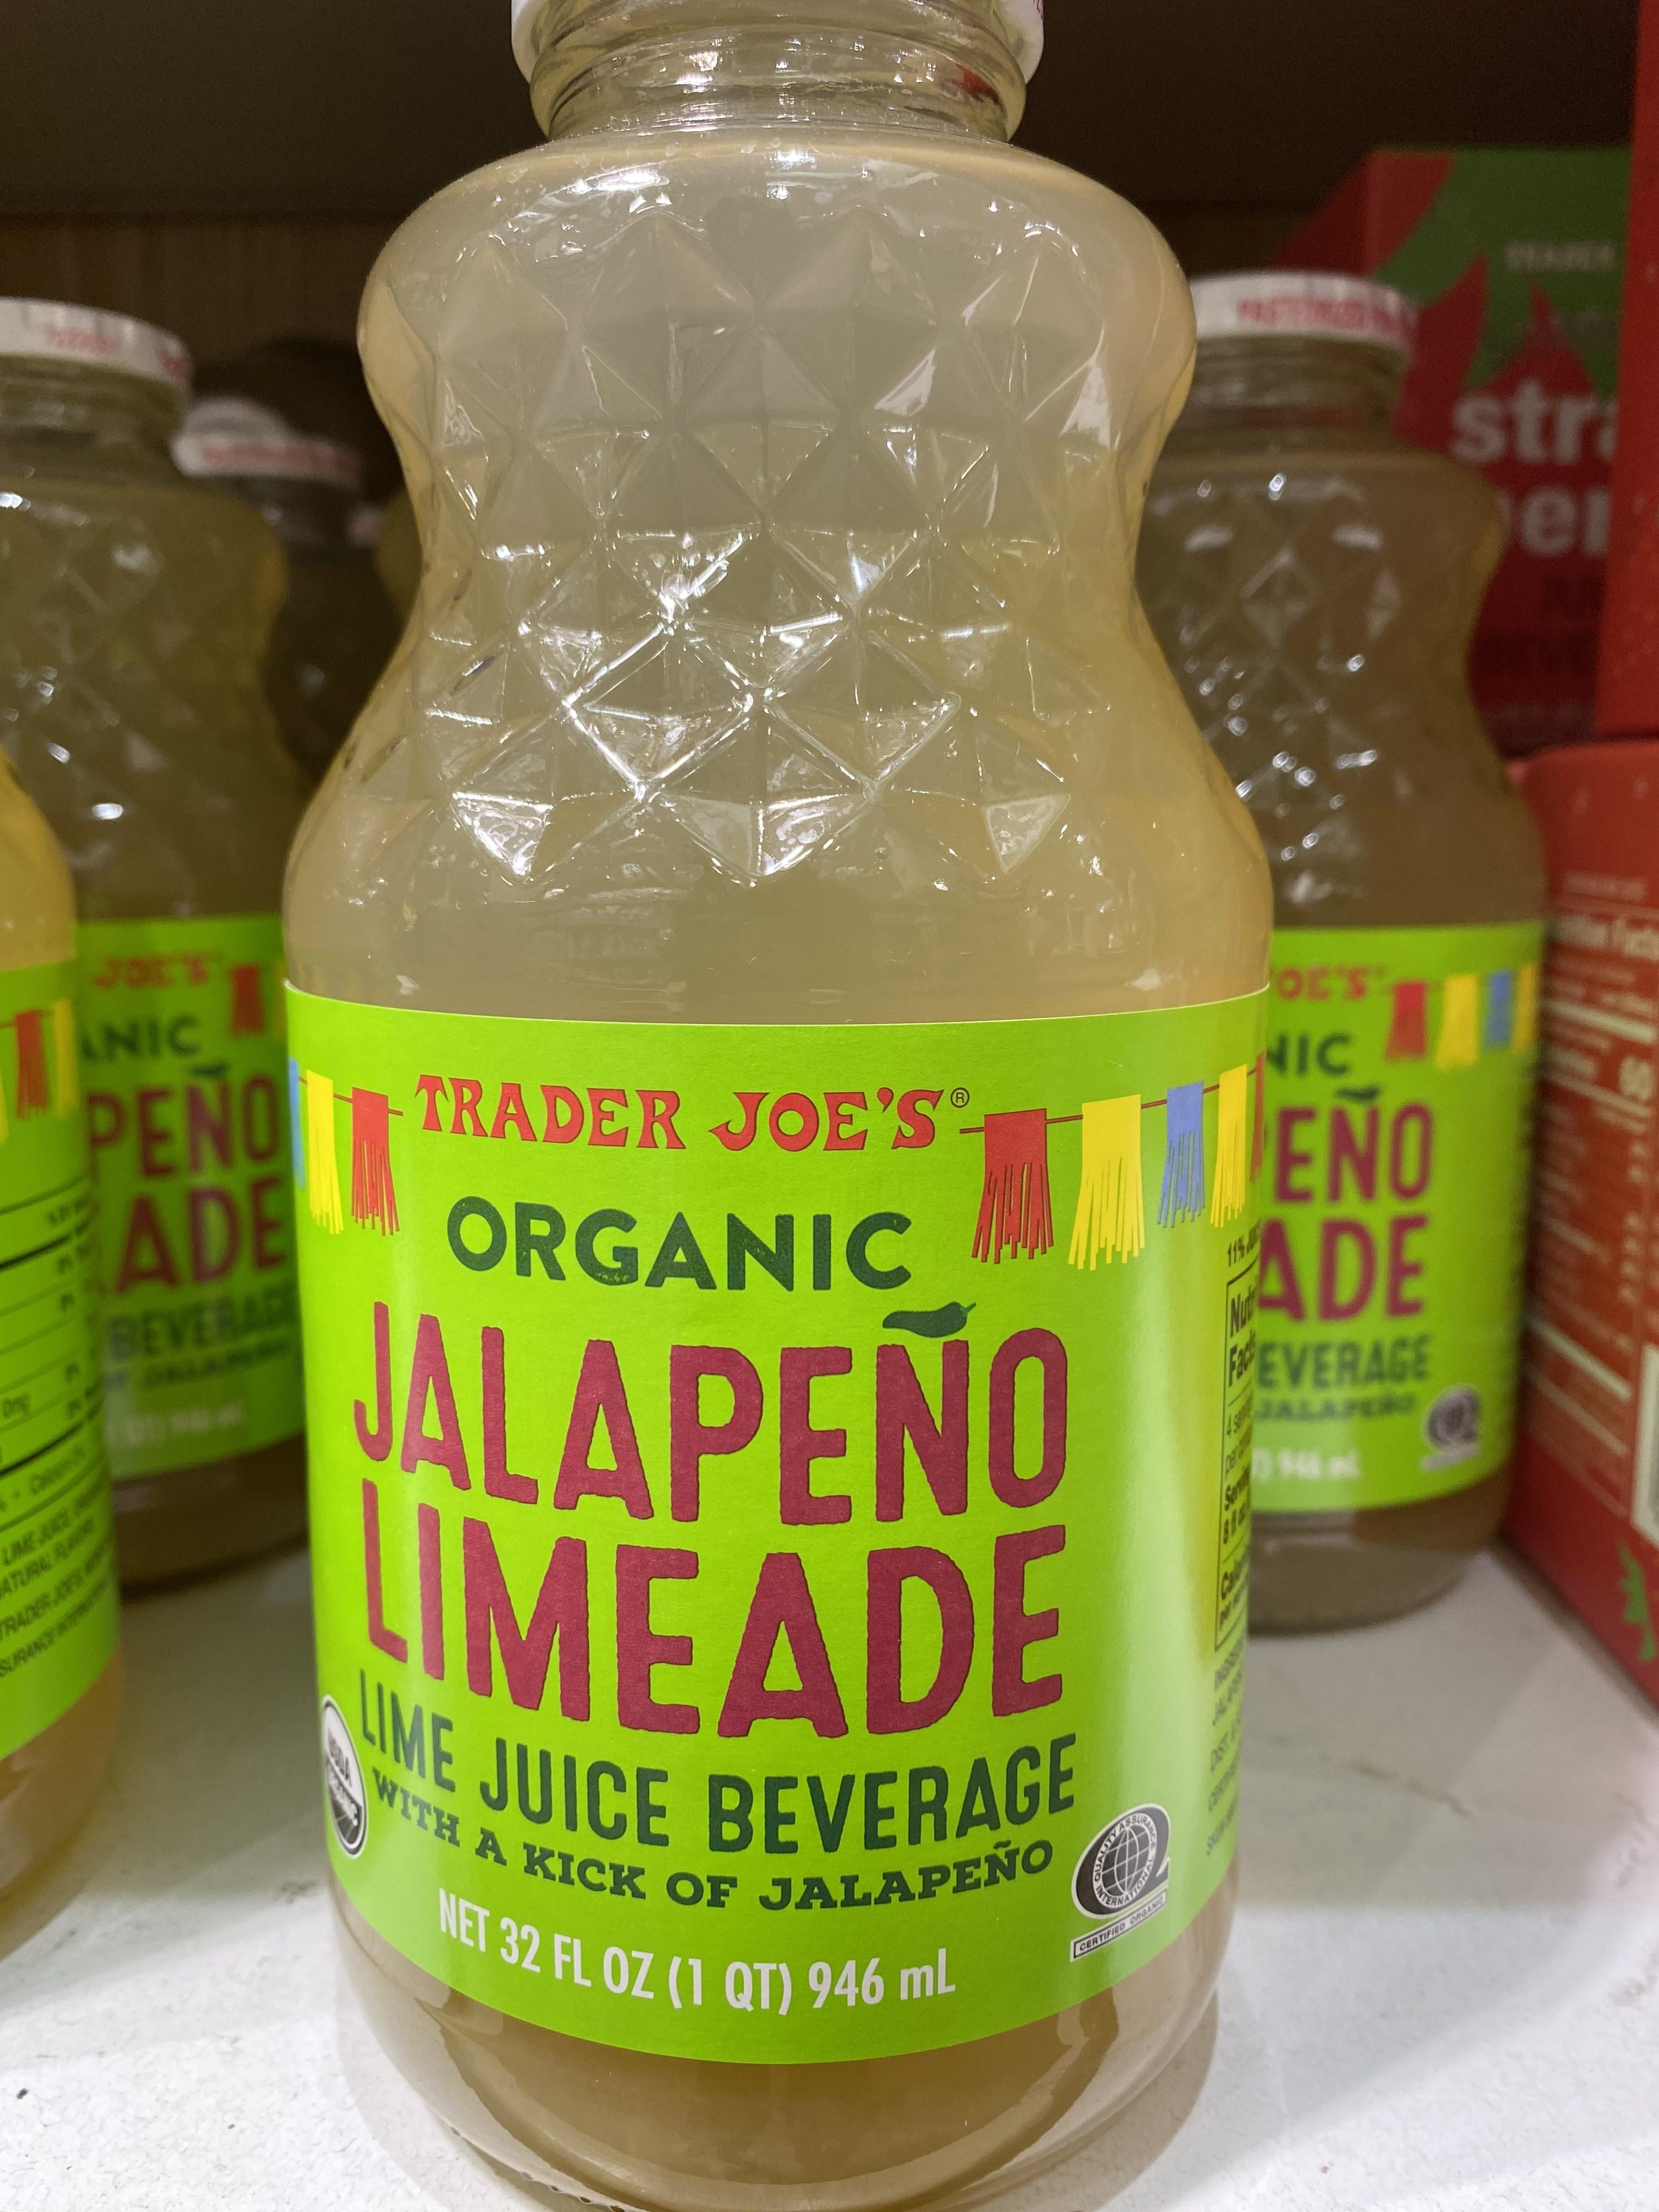 Trader Joe's Jalapeño Limeade.